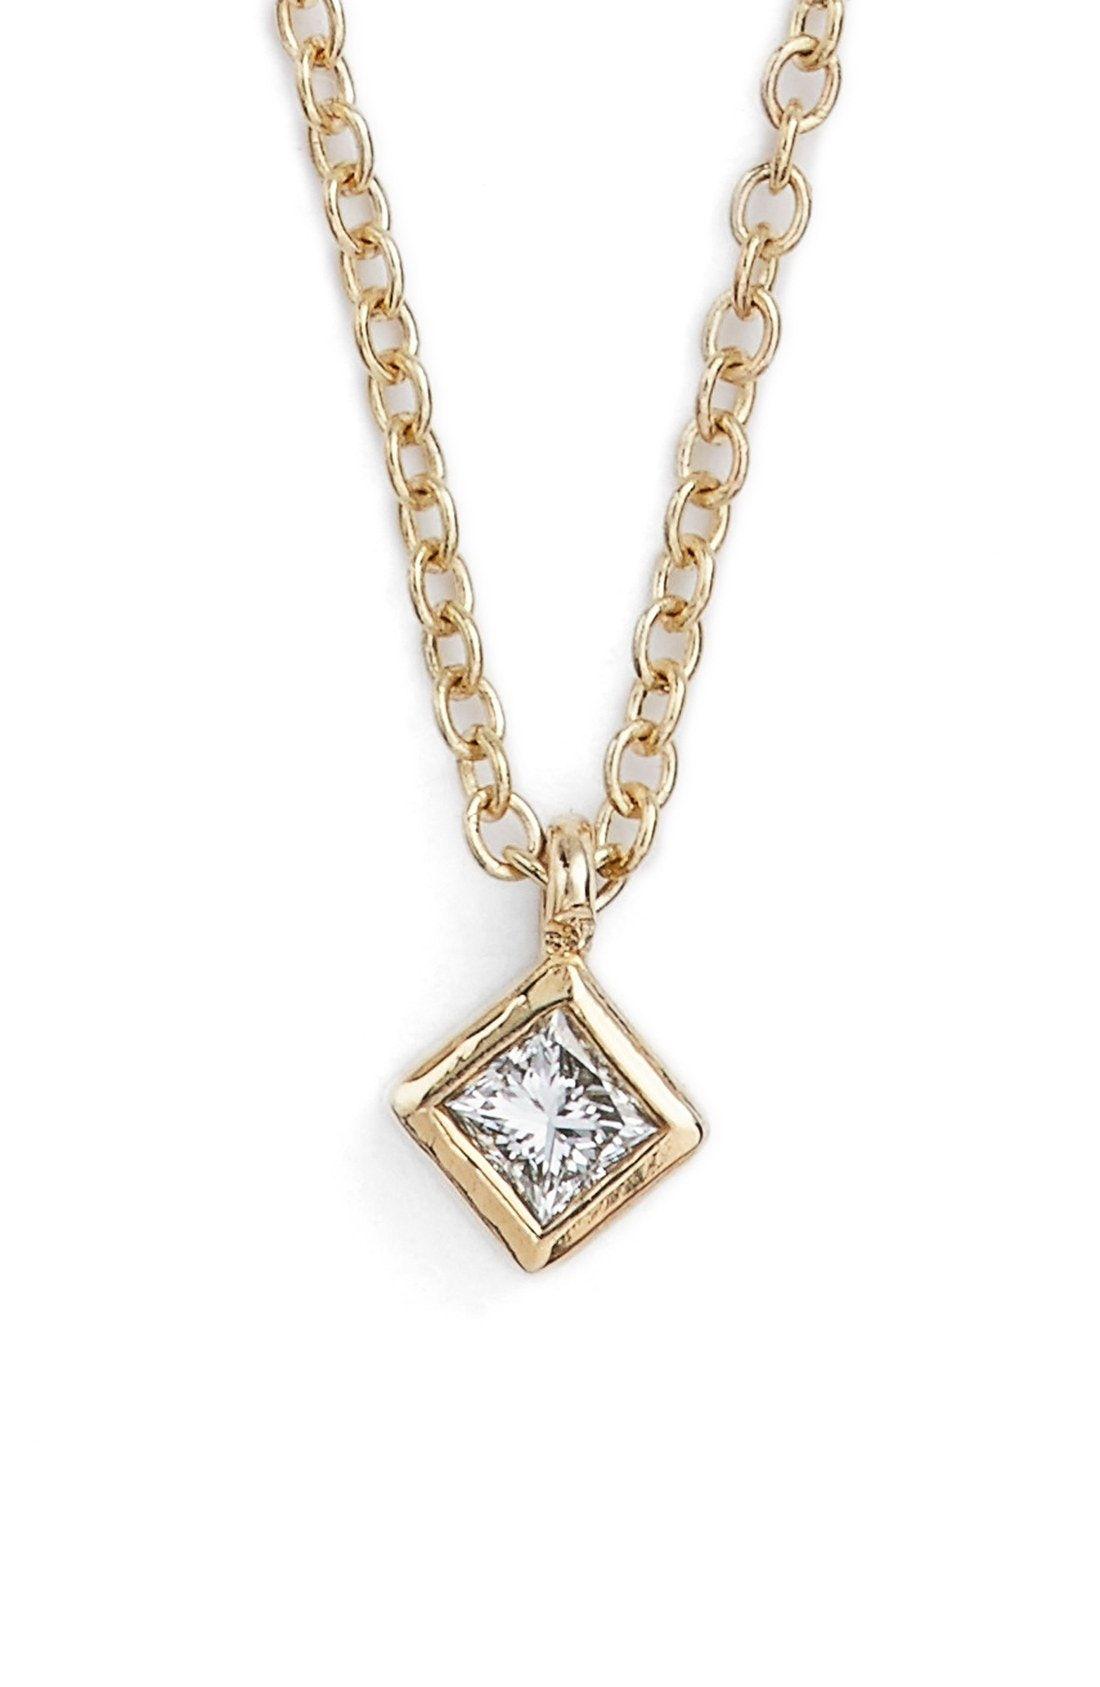 New zo chicco princess diamond pendant necklaceyellow gold fashion chicco princess diamond pendant necklaceyellow gold fashion online 430 aloadofball Images